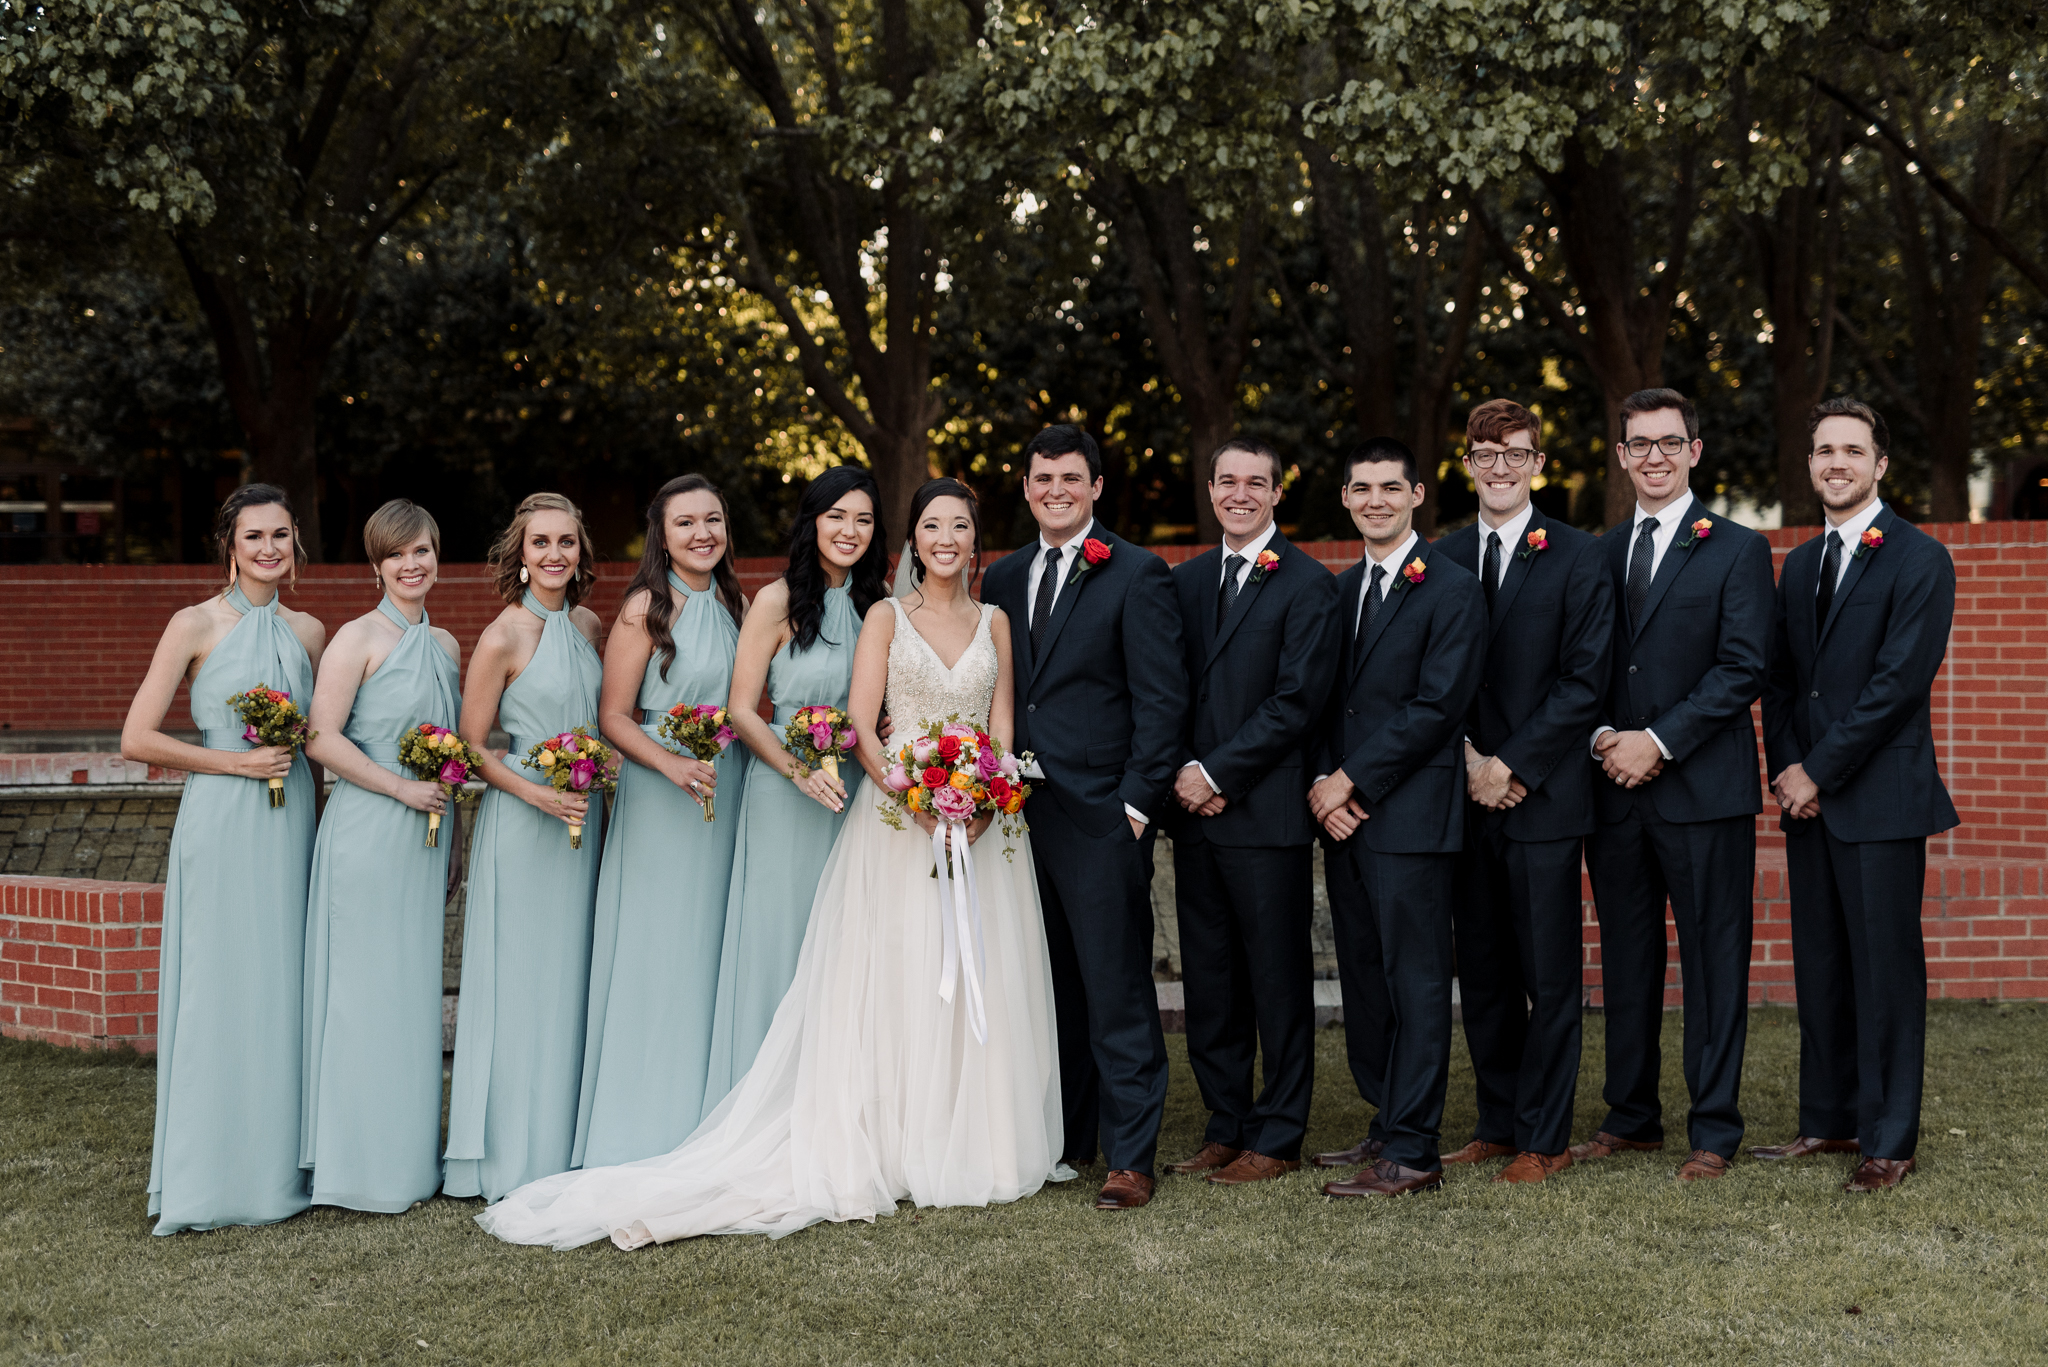 Oklahoma-Christian-University-Wedding-8522.jpg